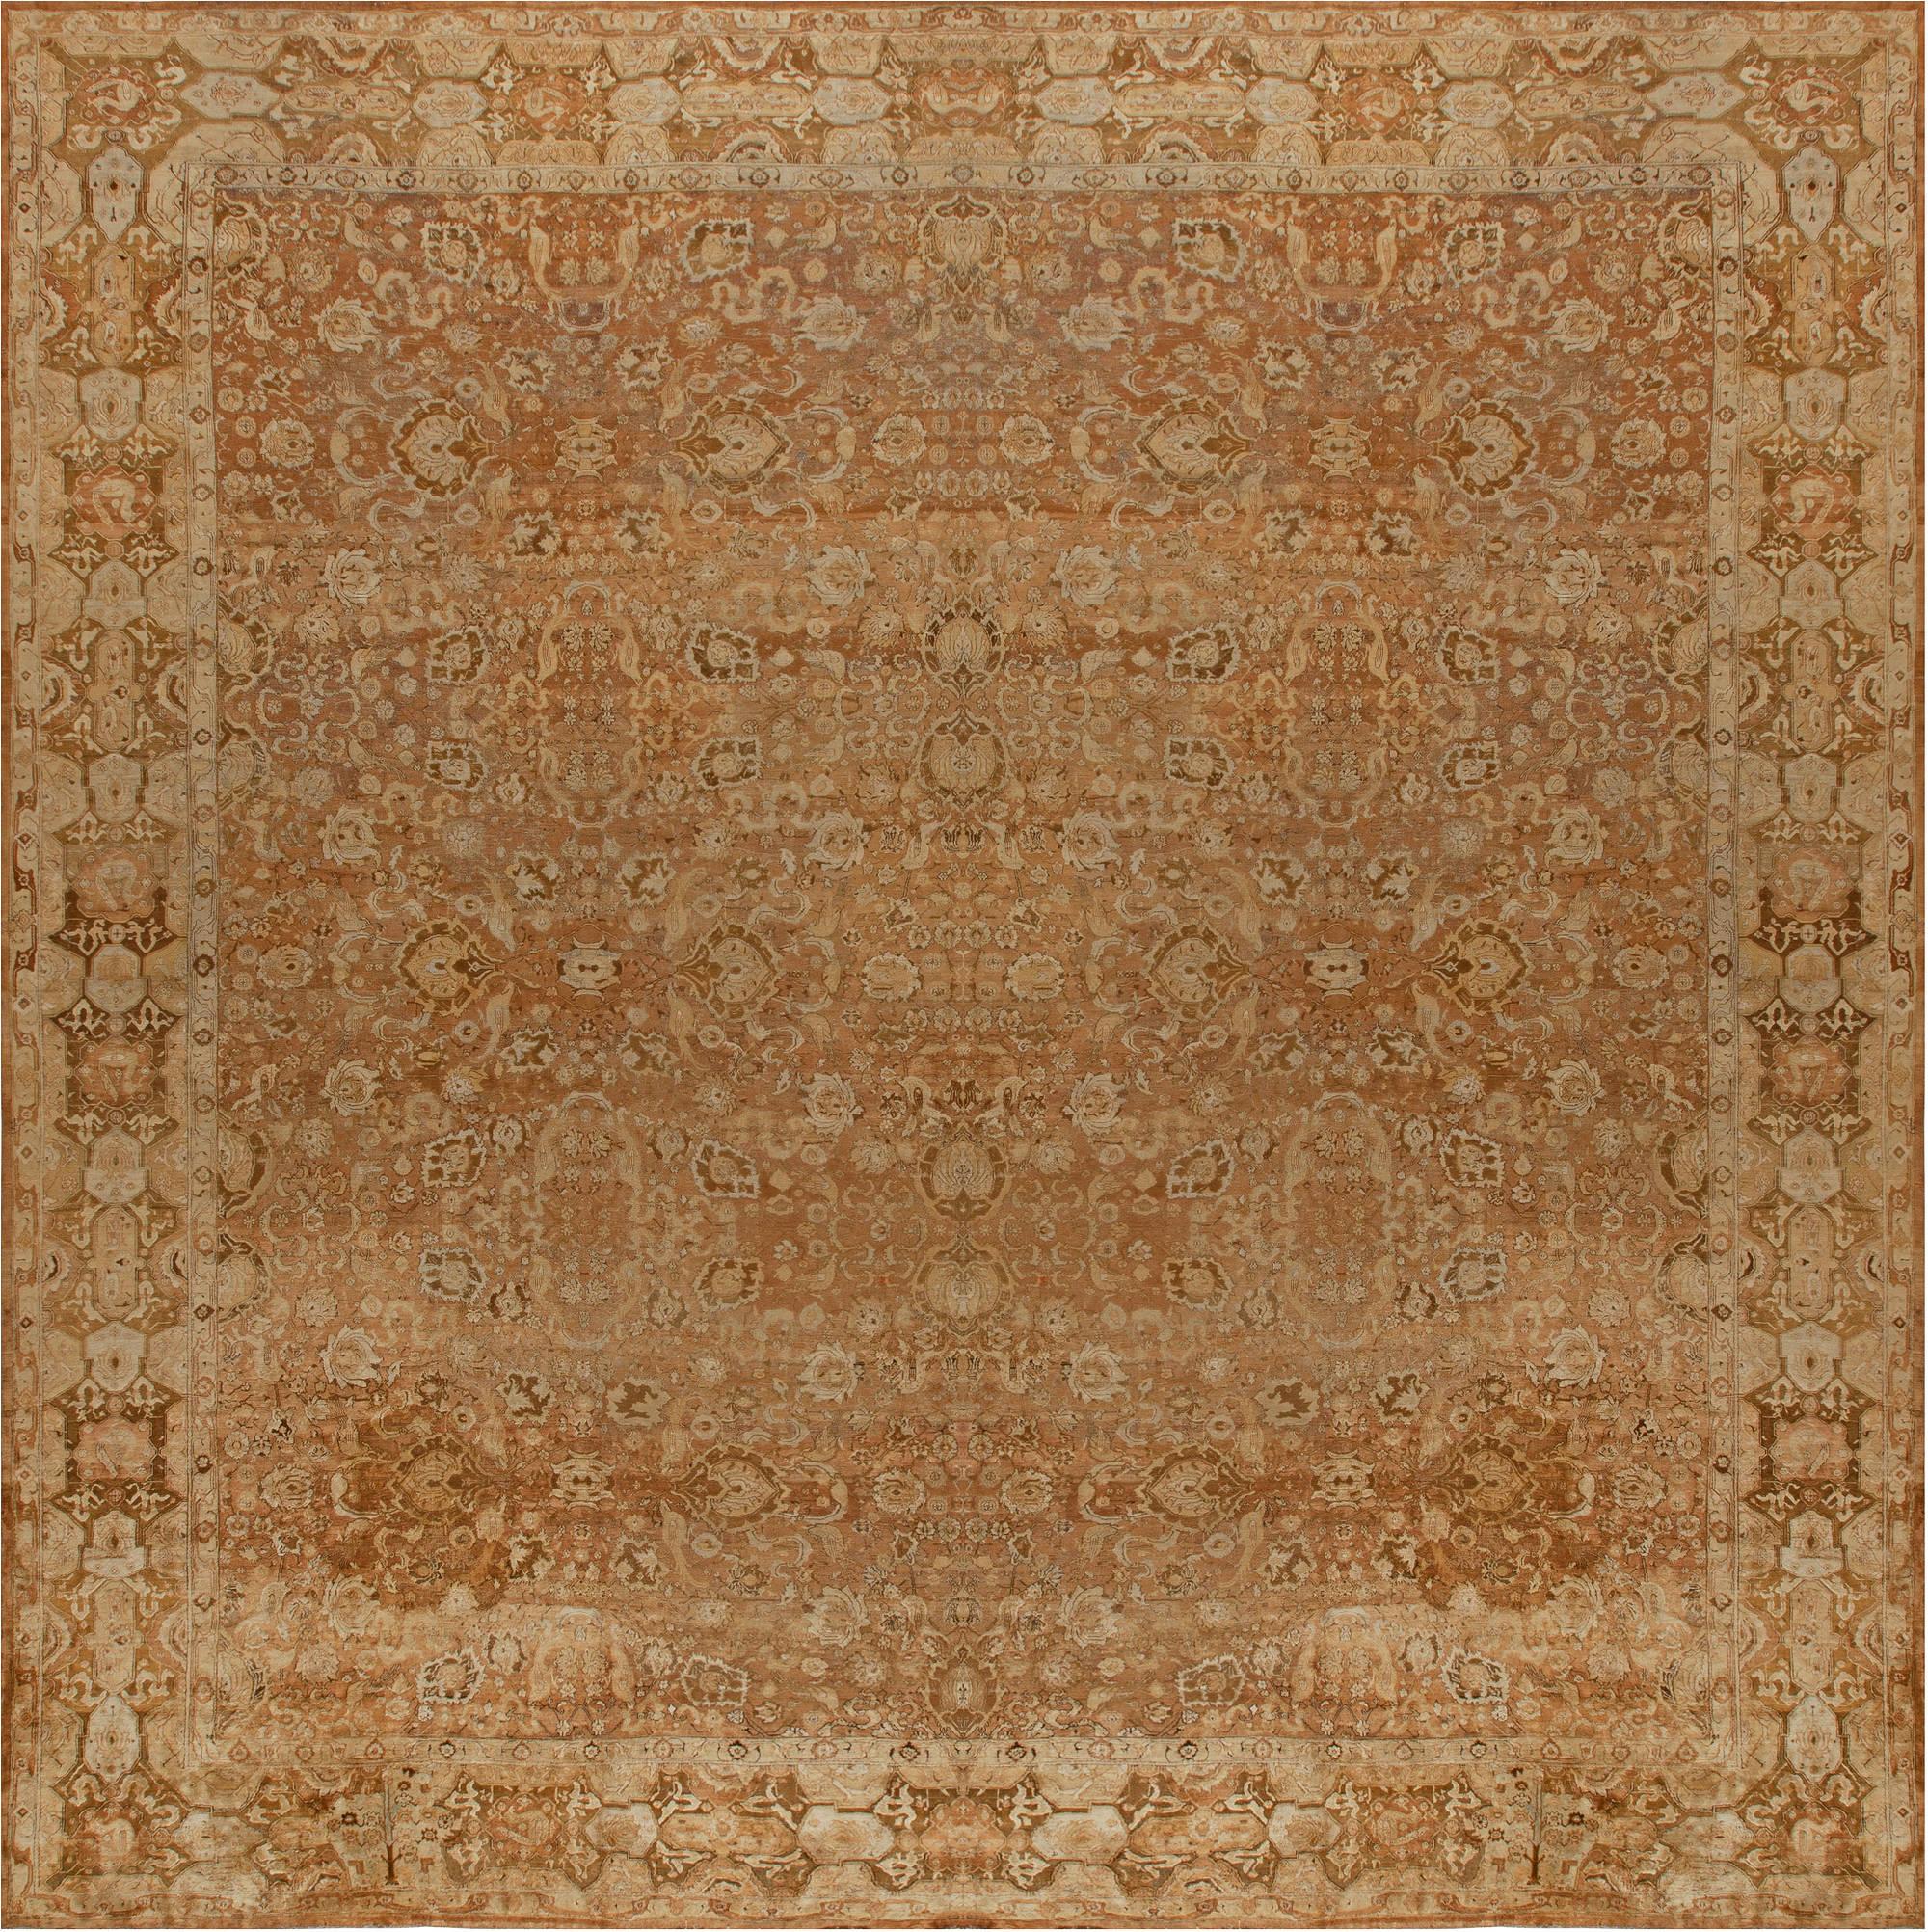 Oversized Antique Indian Agra Carpet BB5675